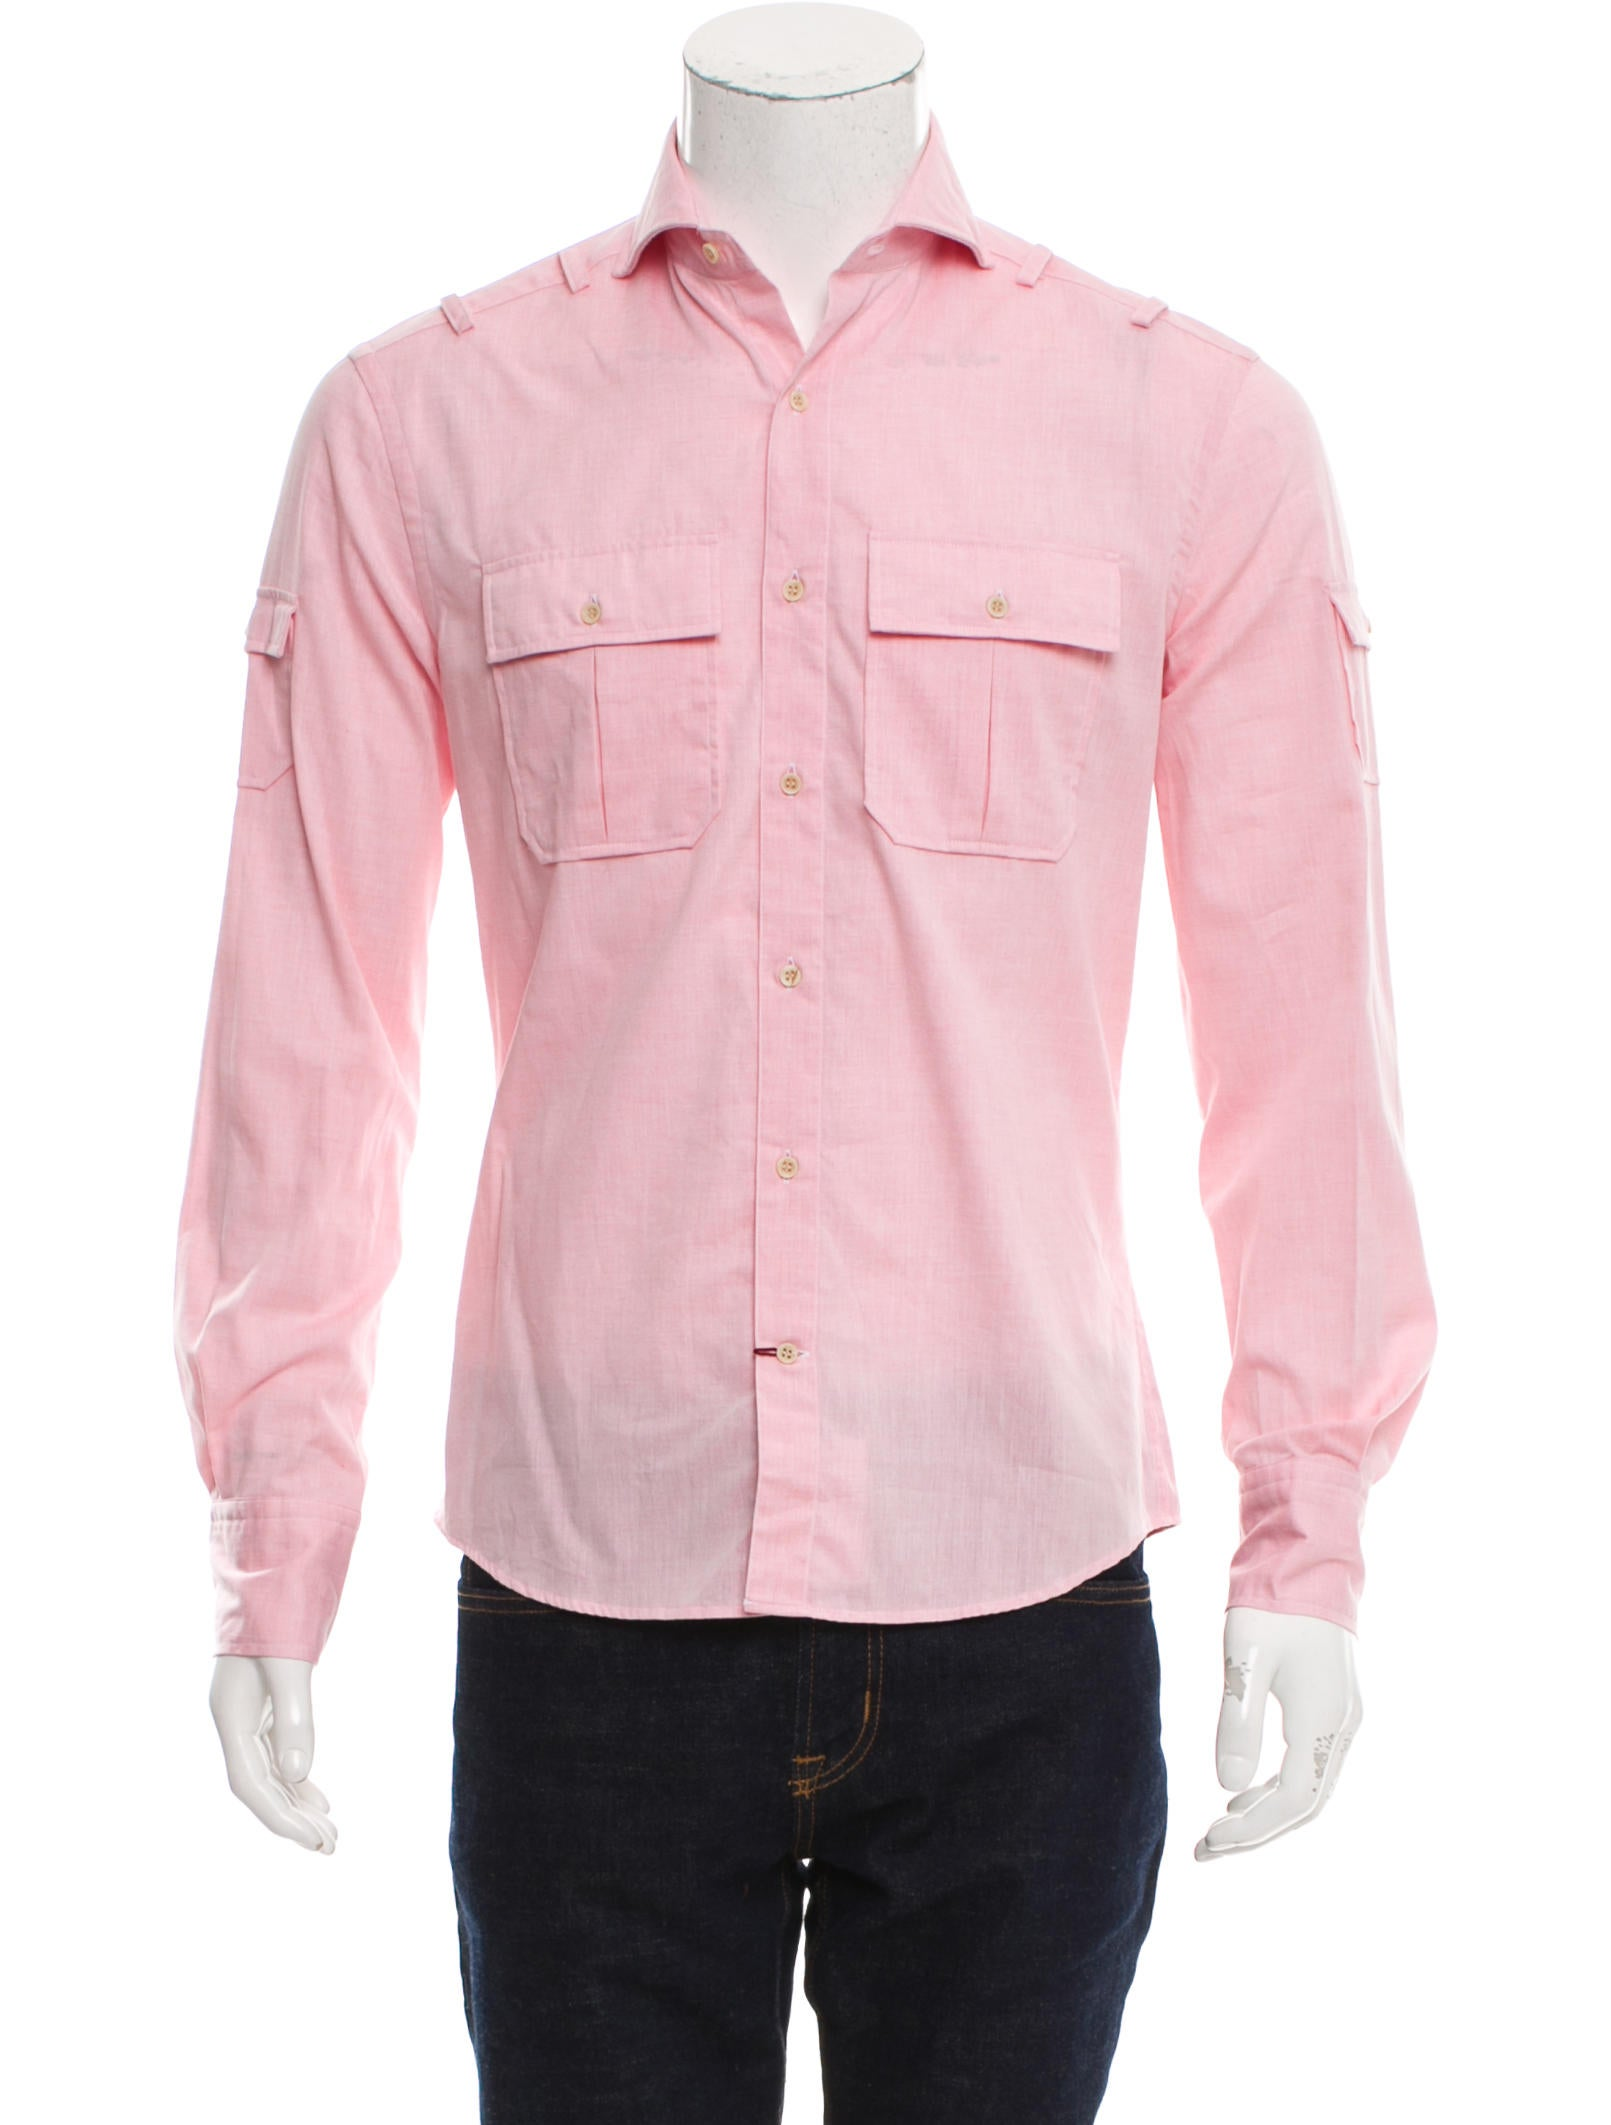 Michael bastian woven utility shirt w tags clothing Woven t shirt tags